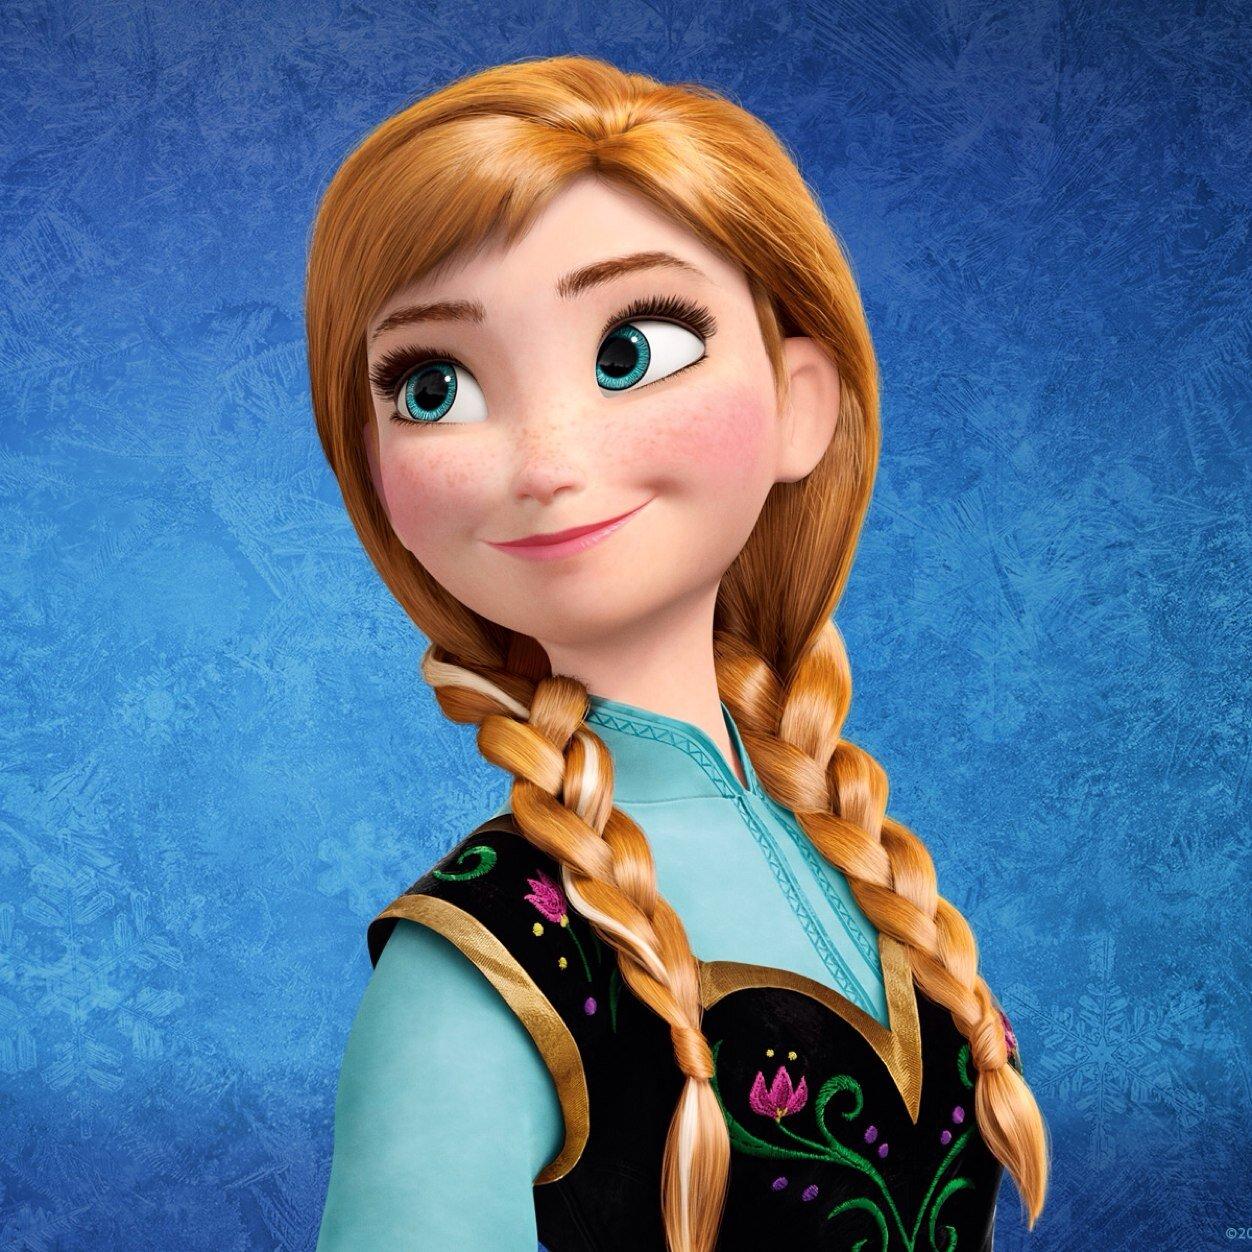 Princess Anna  PrincessAnna70  Twitter